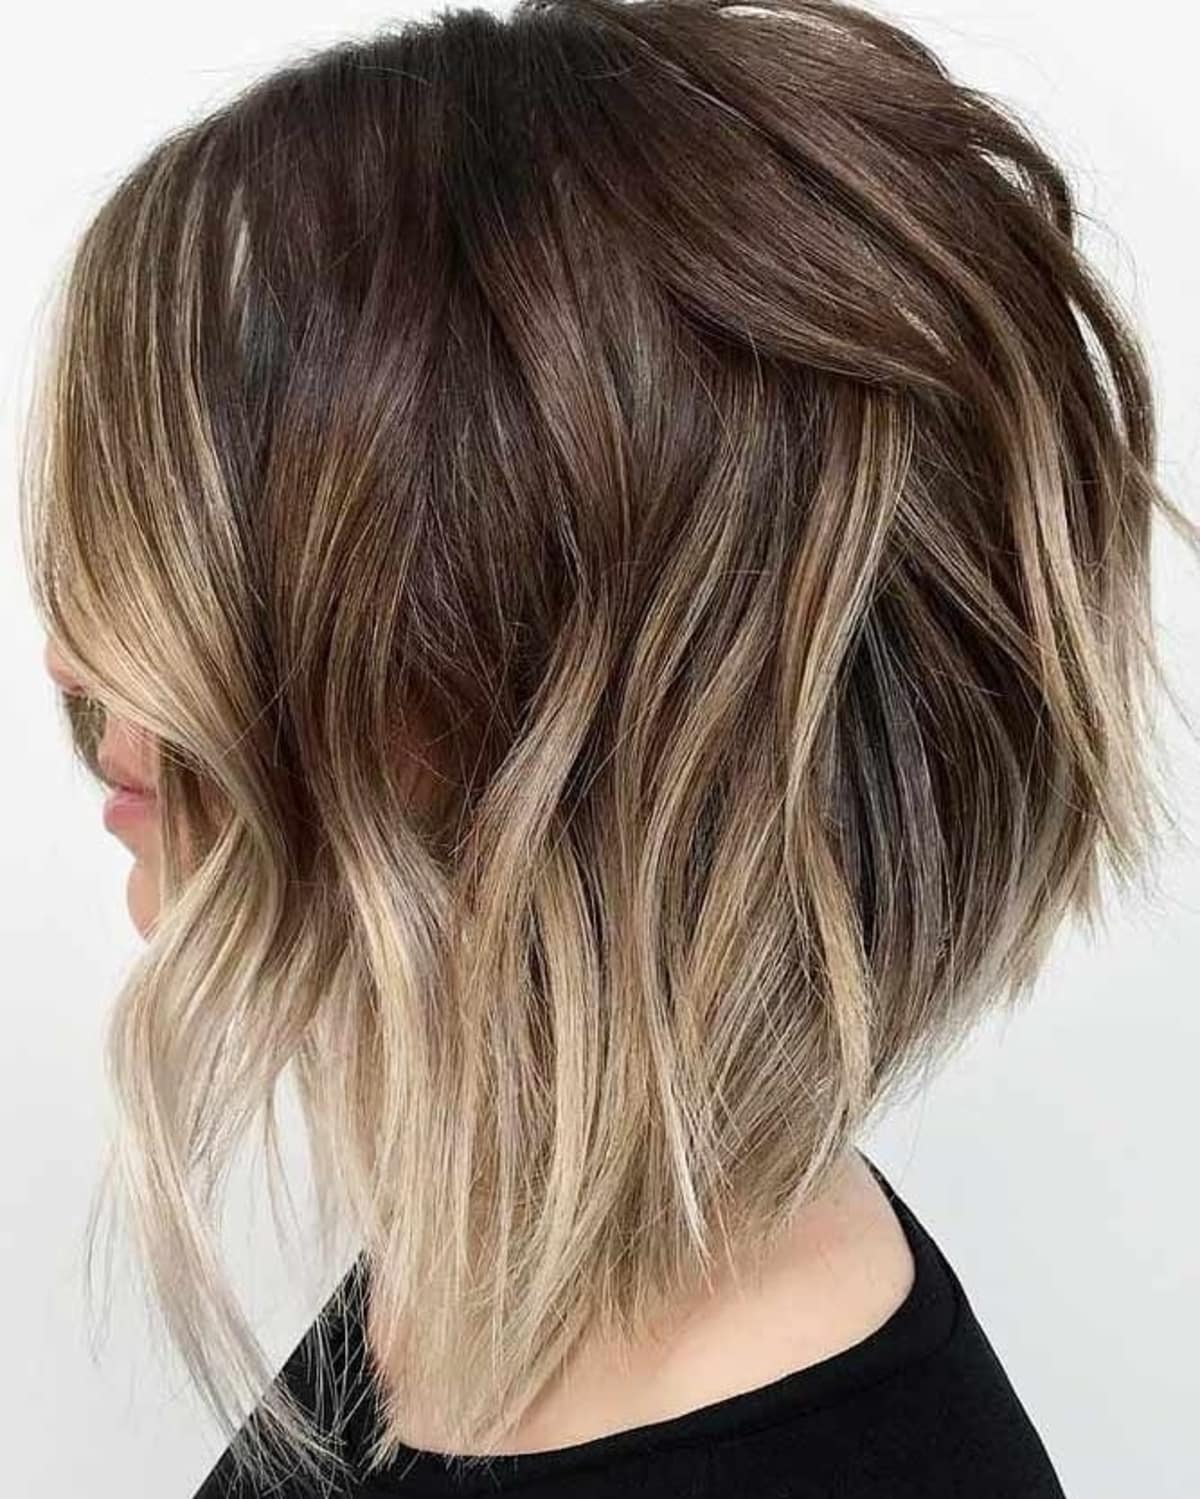 21 Trendiest Long Shaggy Bob Haircuts for Carefree Women